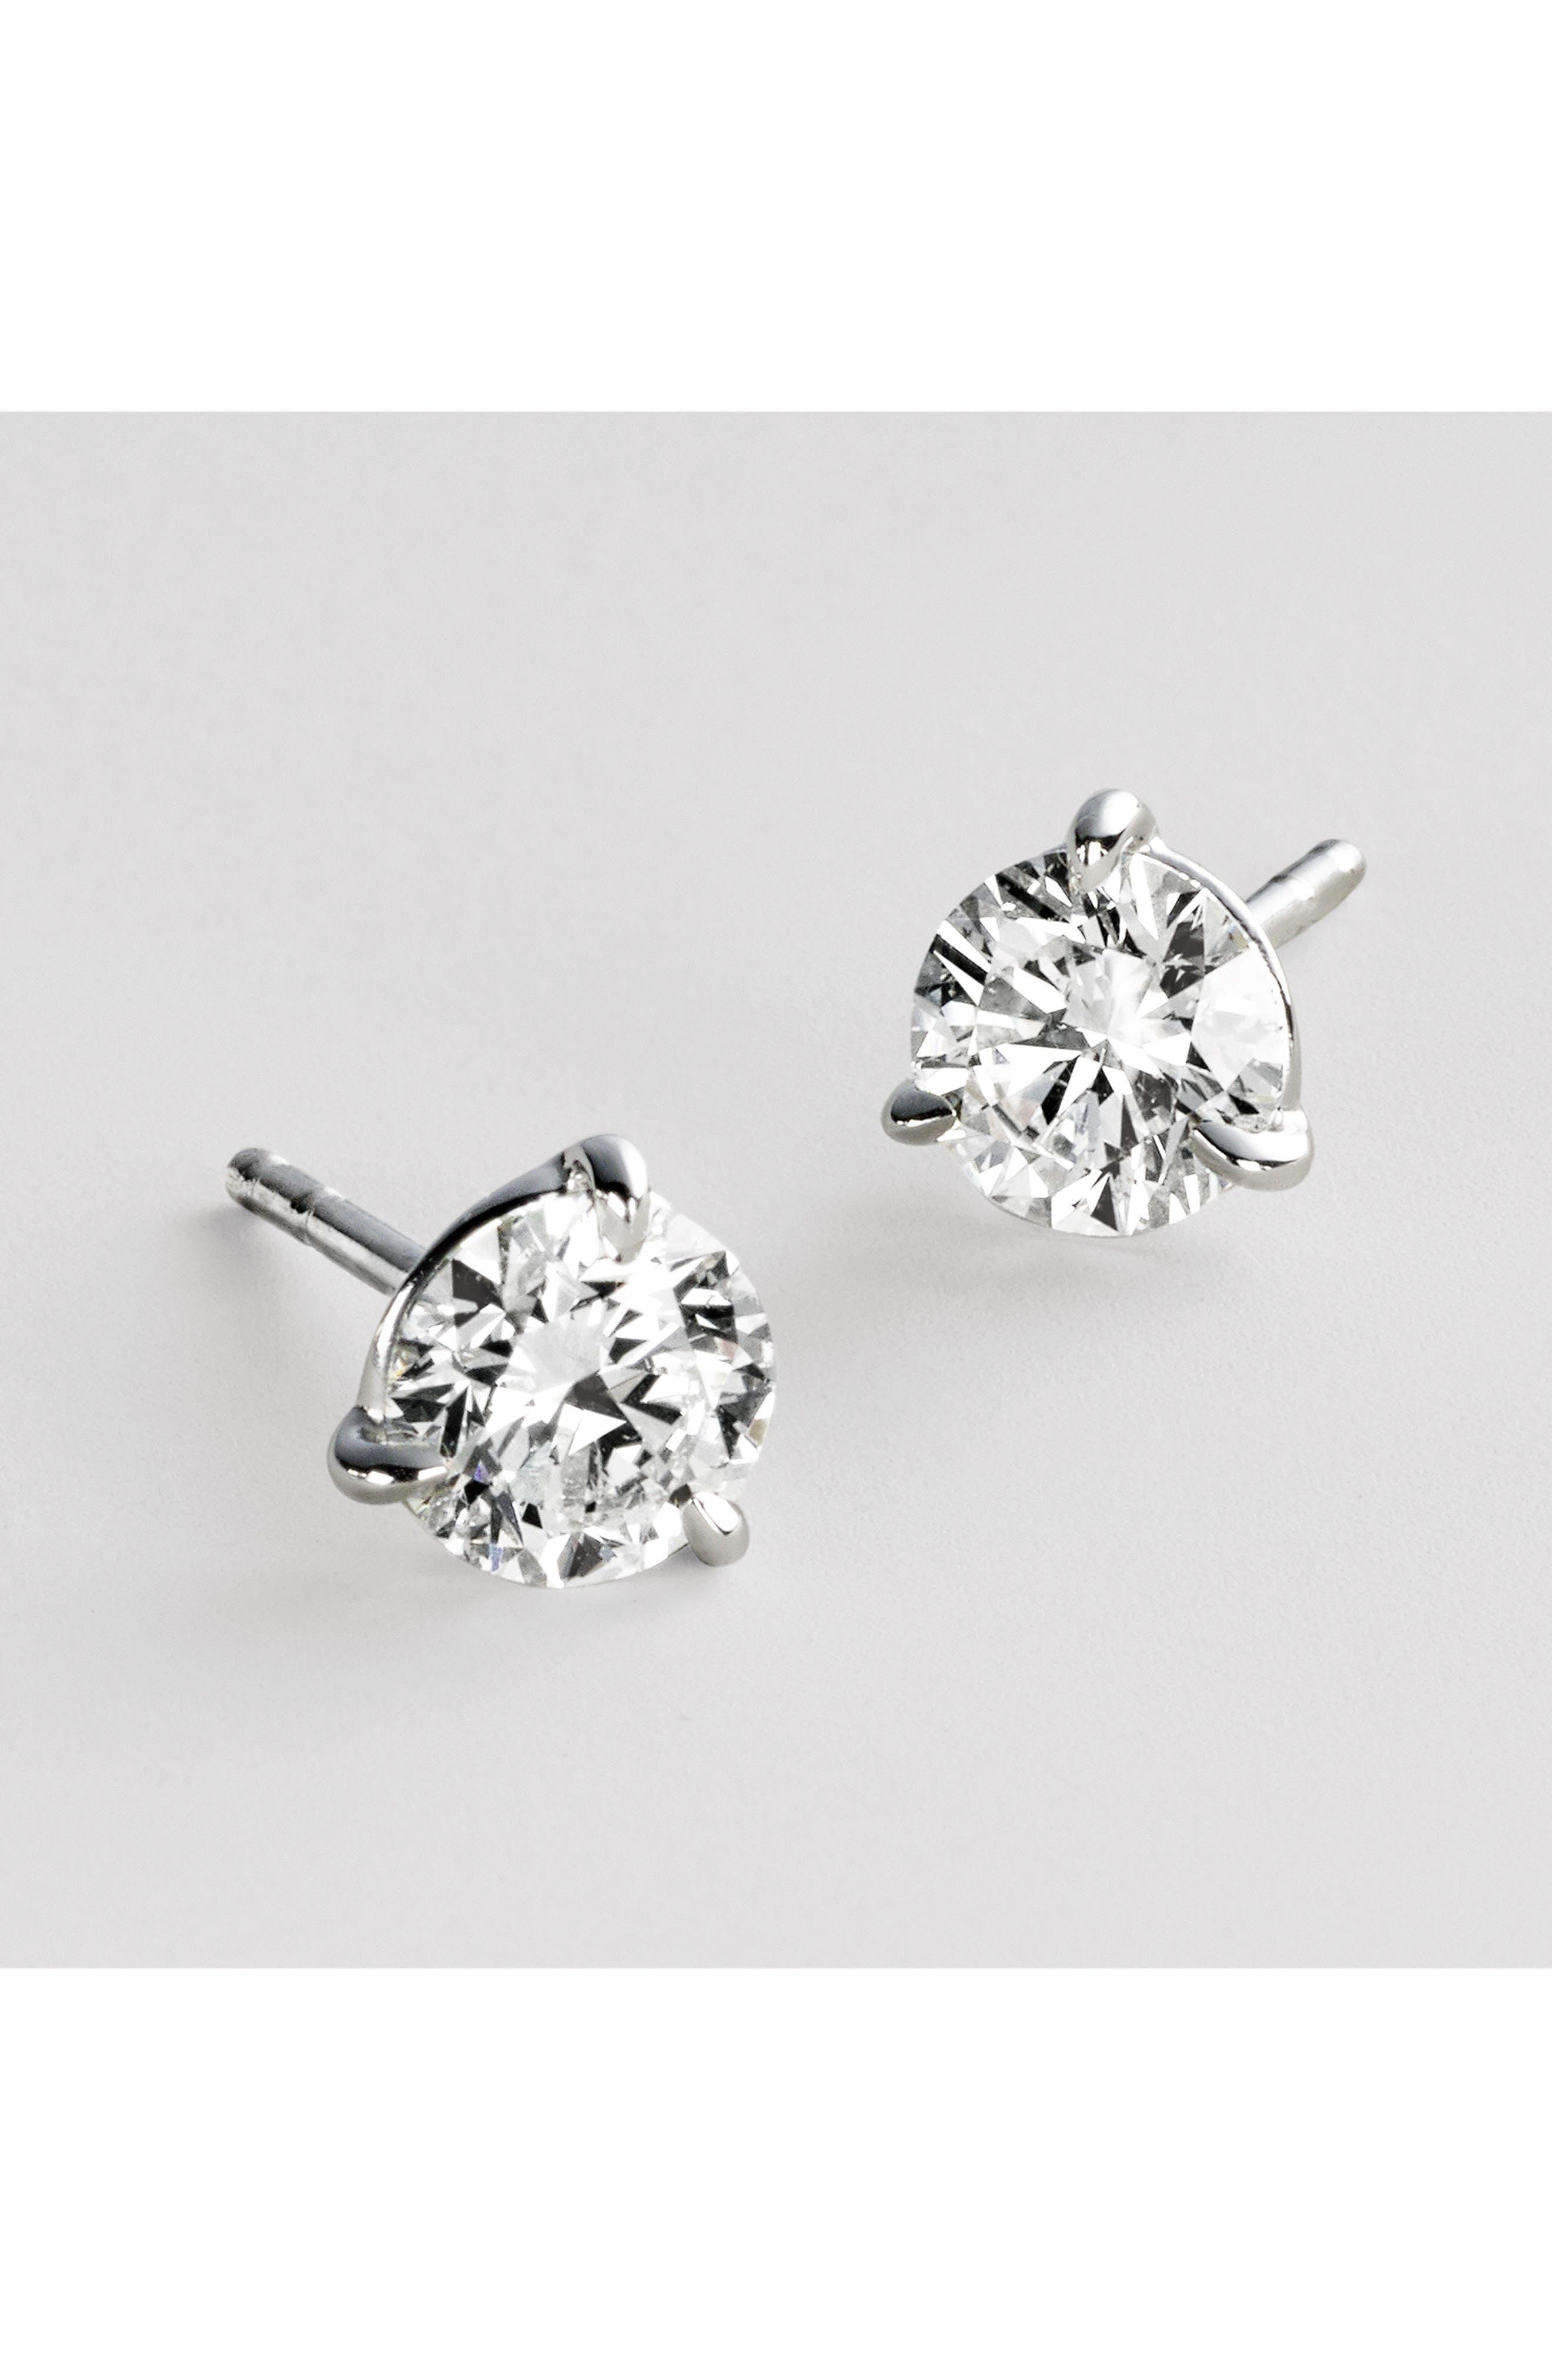 1.50ct tw Diamond & Platinum Stud Earrings,                             Alternate thumbnail 3, color,